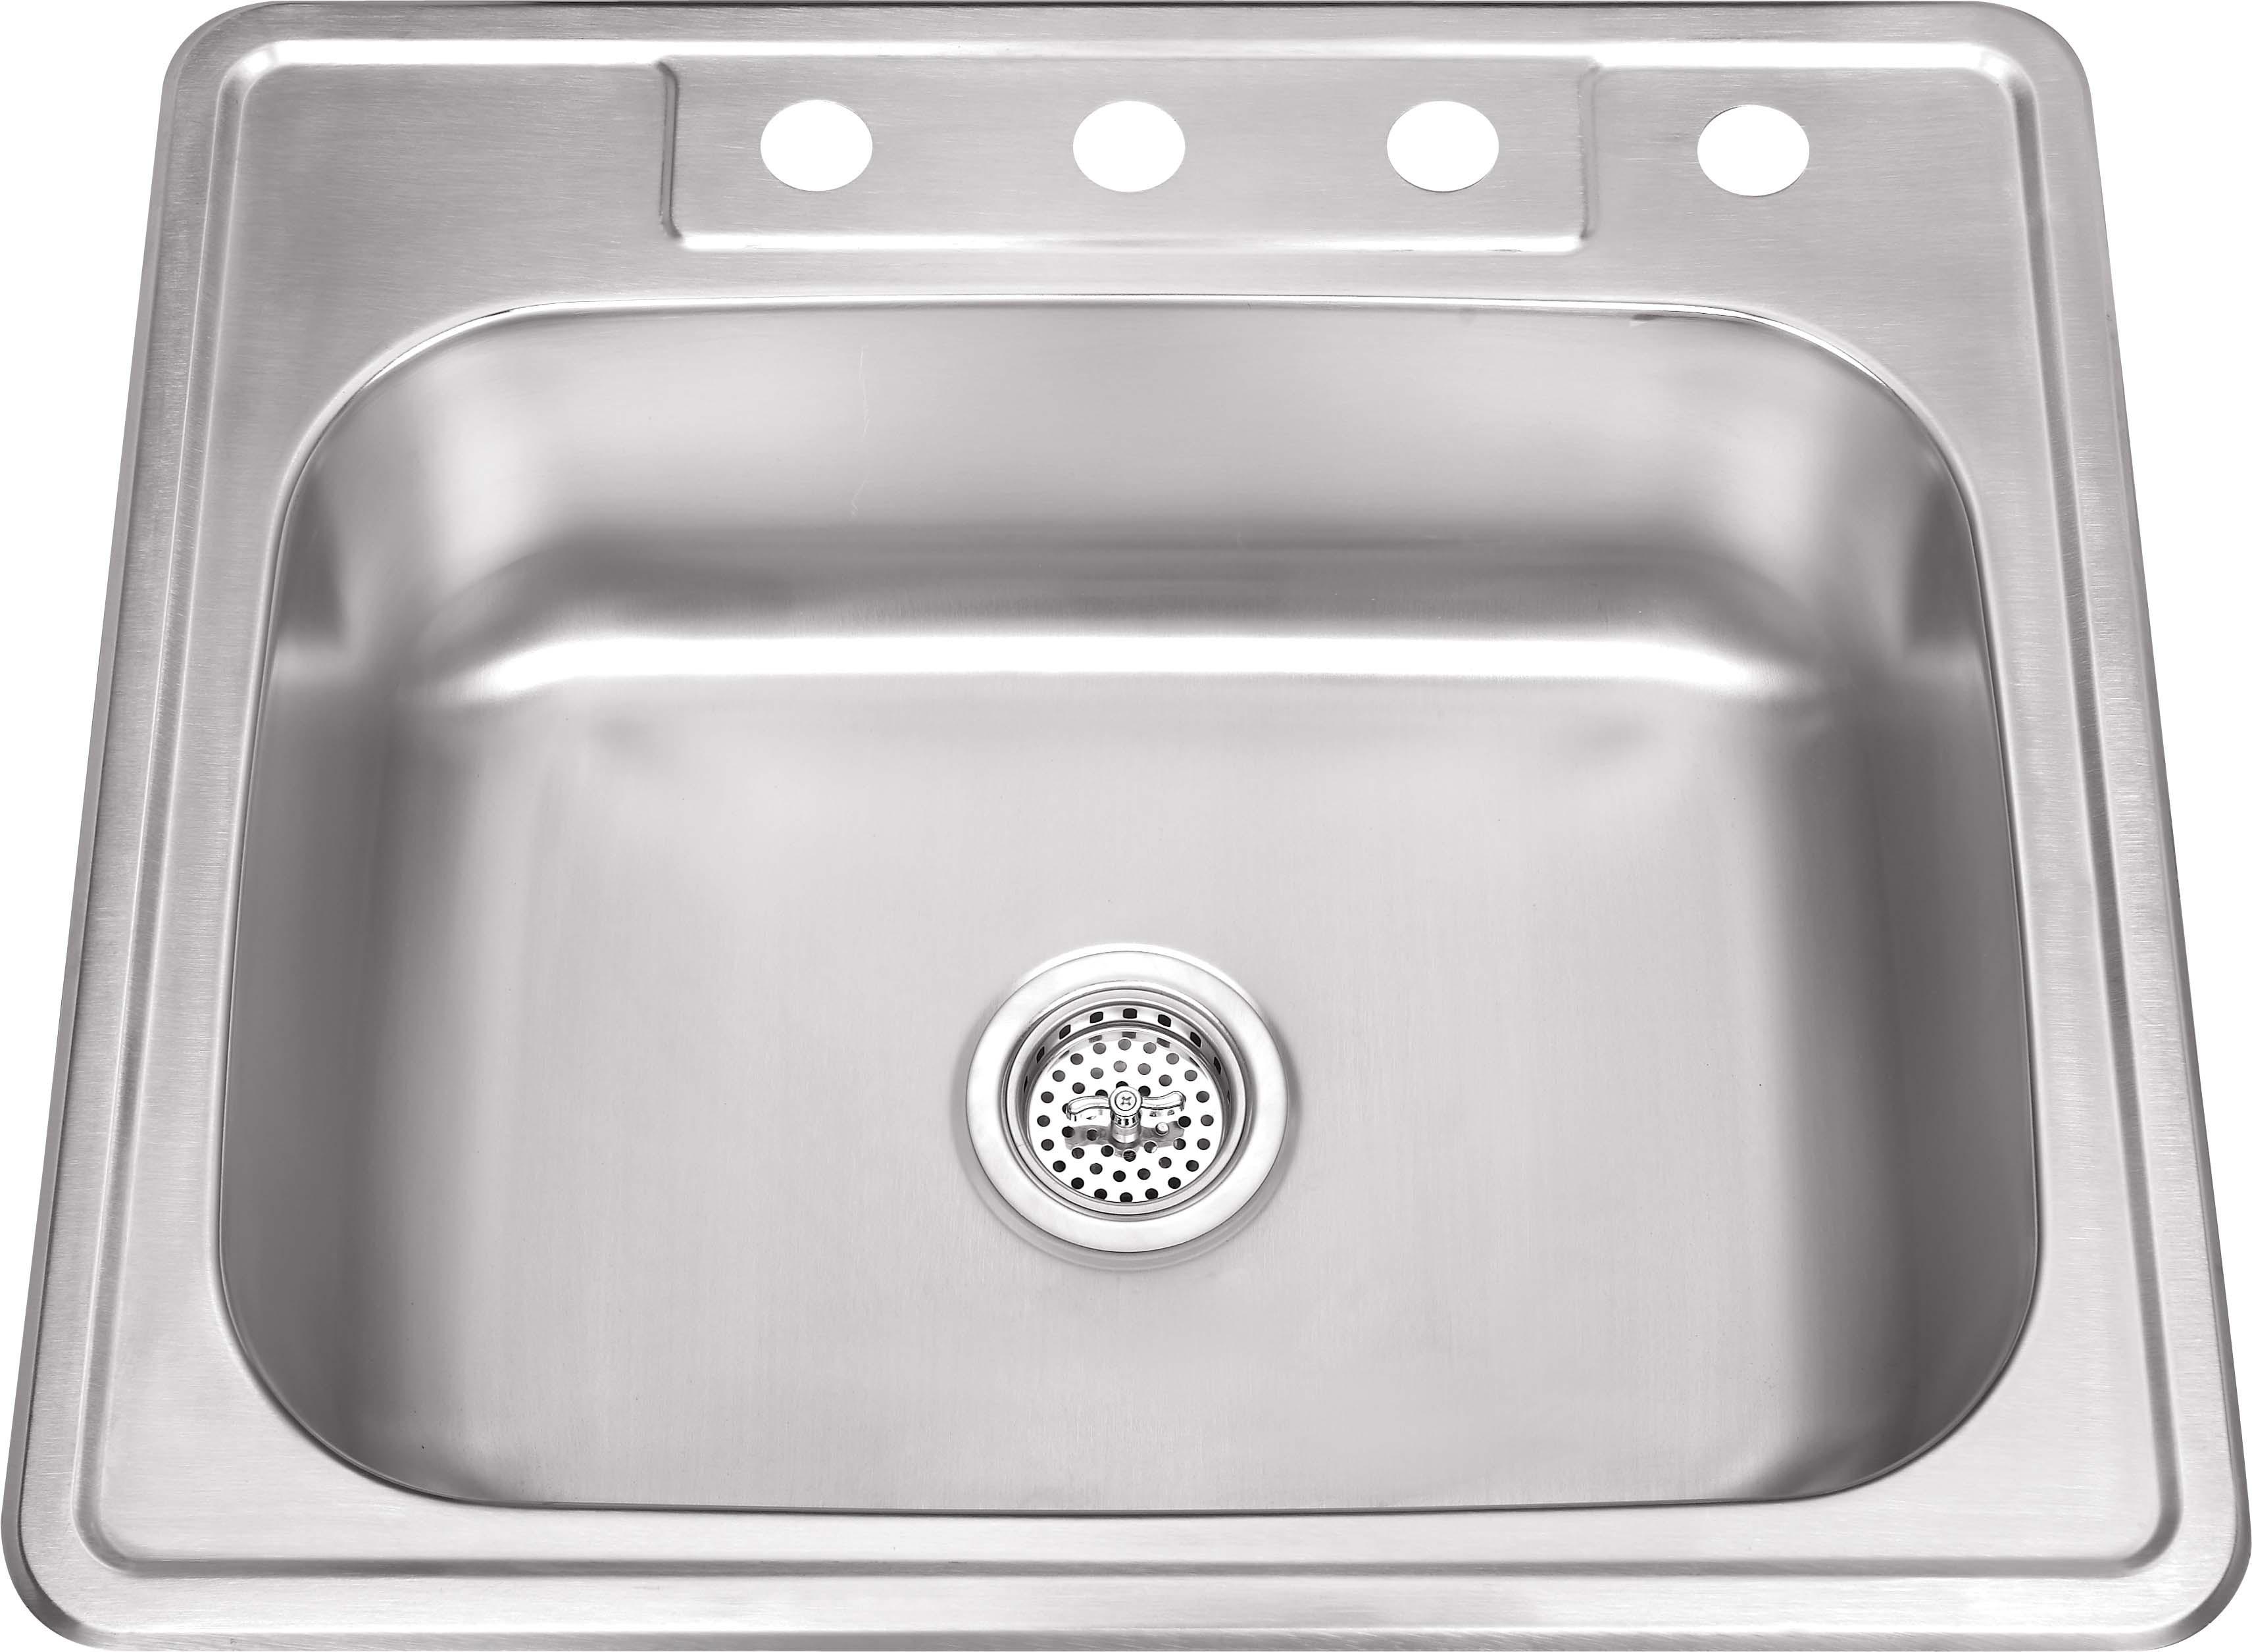 Cahaba CA113SB25 25 Inch 20 Gauge Drop In S. Steel Single Bowl Kitchen Sink